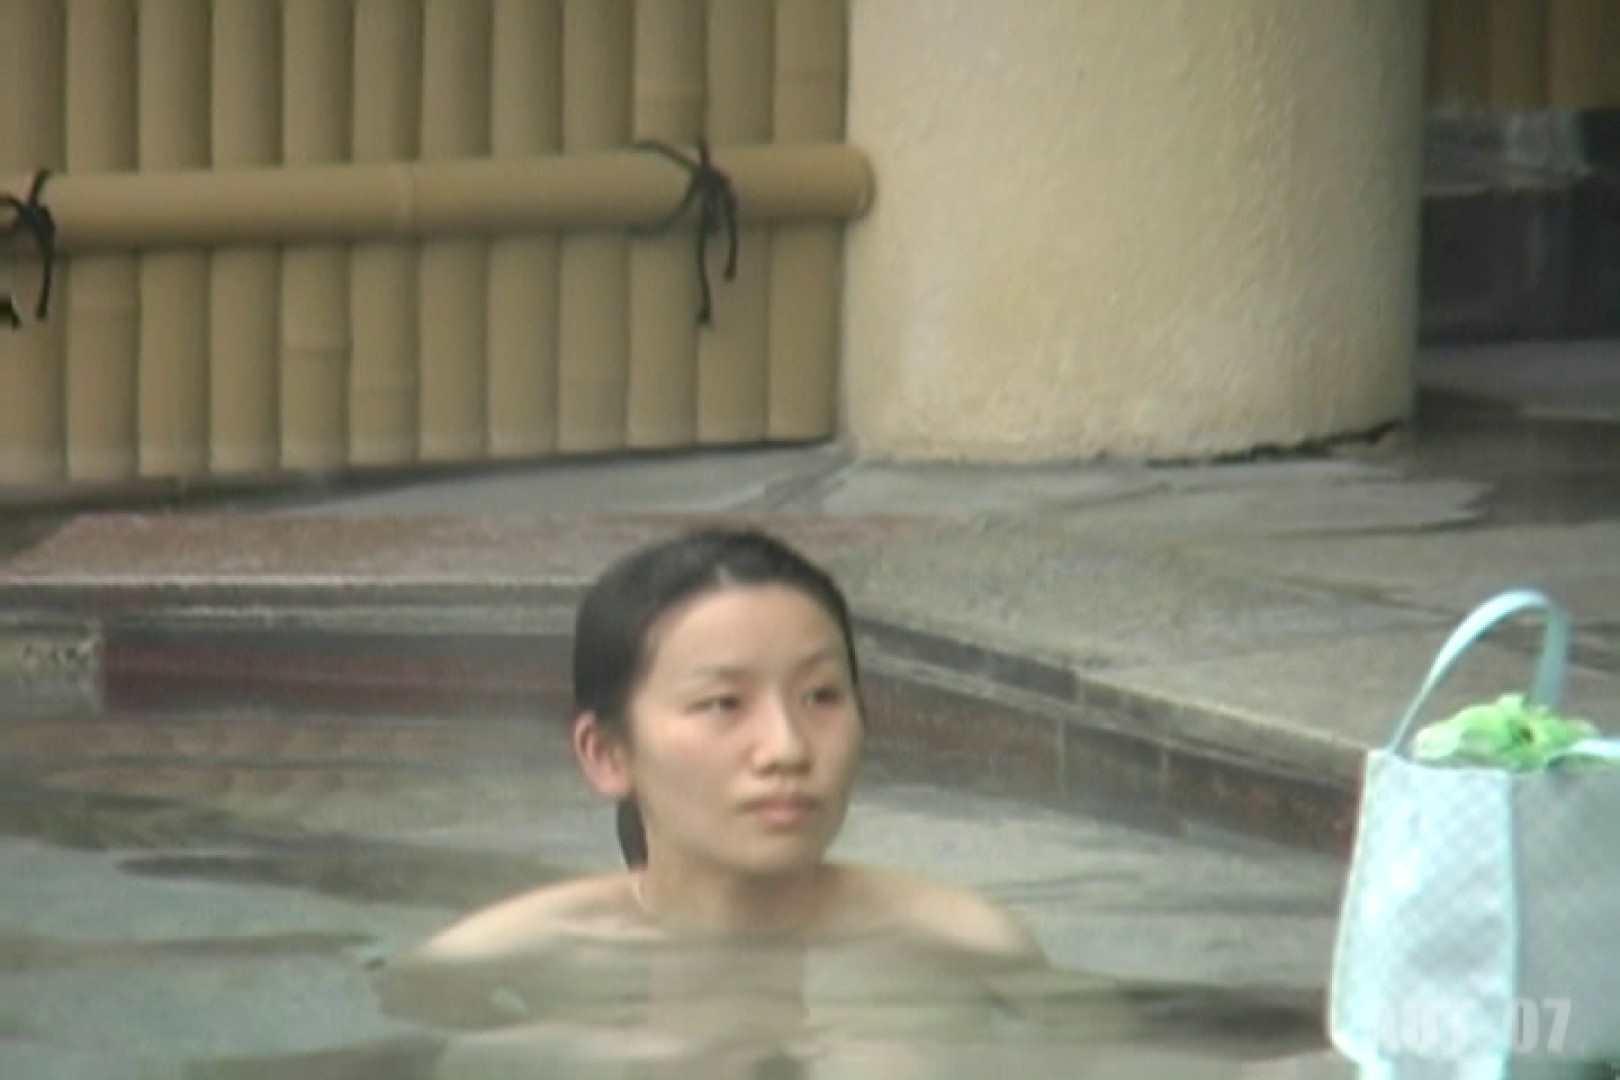 Aquaな露天風呂Vol.769 盗撮シリーズ | 露天風呂編  109PIX 91